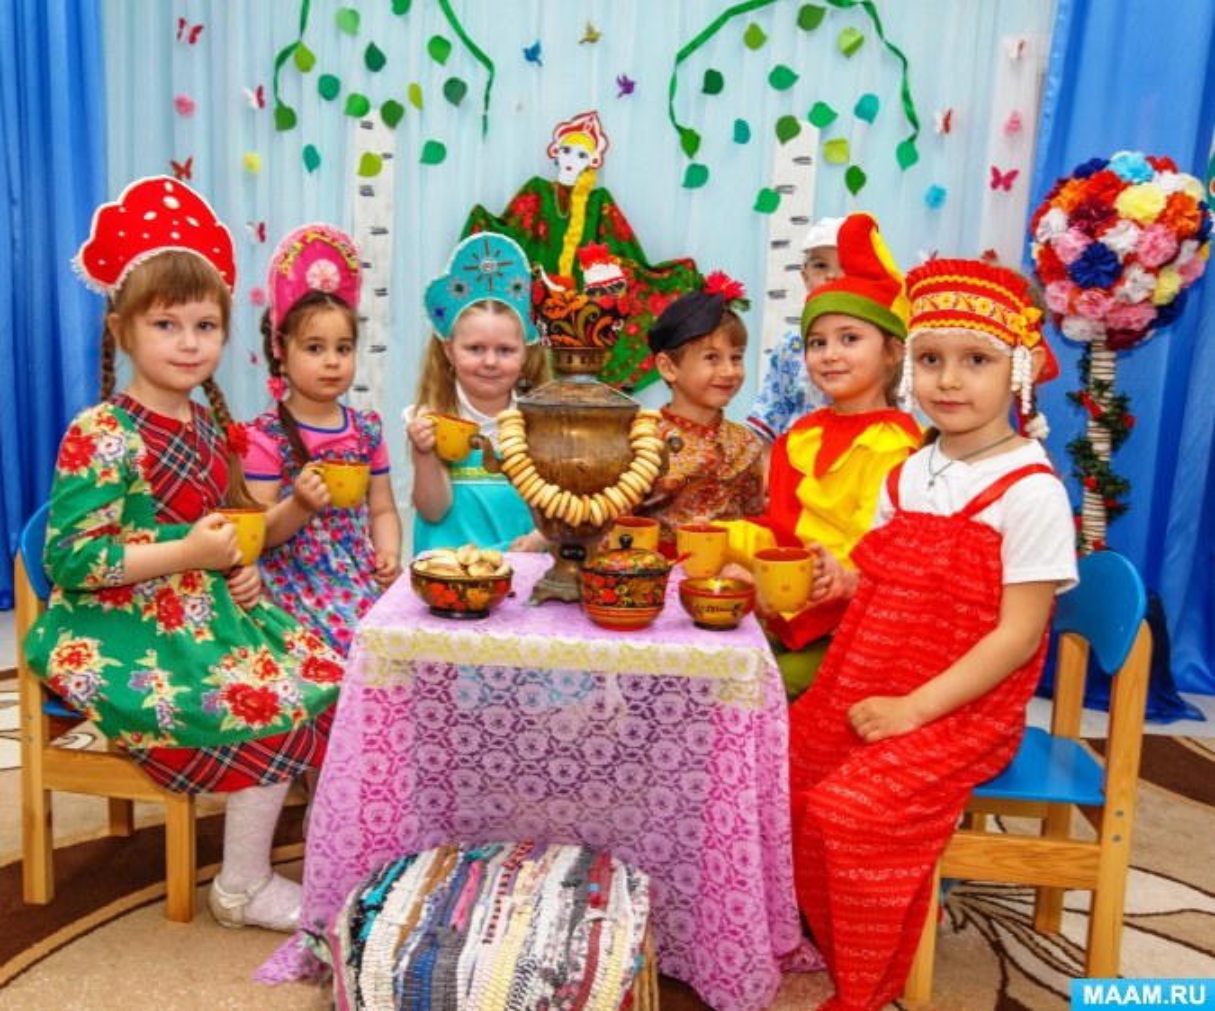 Сценарий детского народного праздника